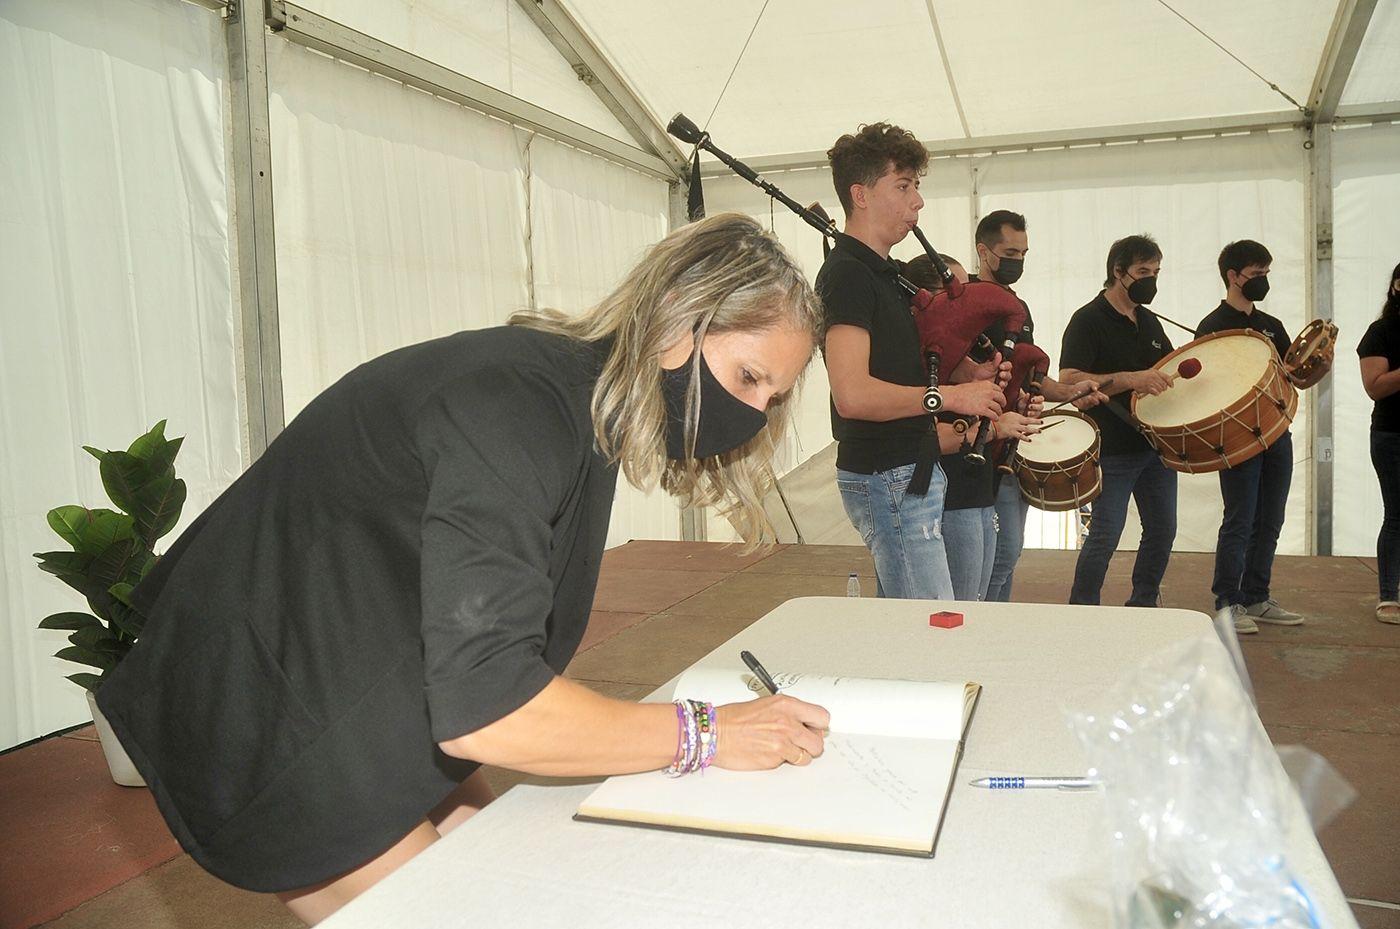 Teresa Portela firma en el libro del Concello, con el grupo Tromentelo al fondo. Rafa Vázquez.jpg